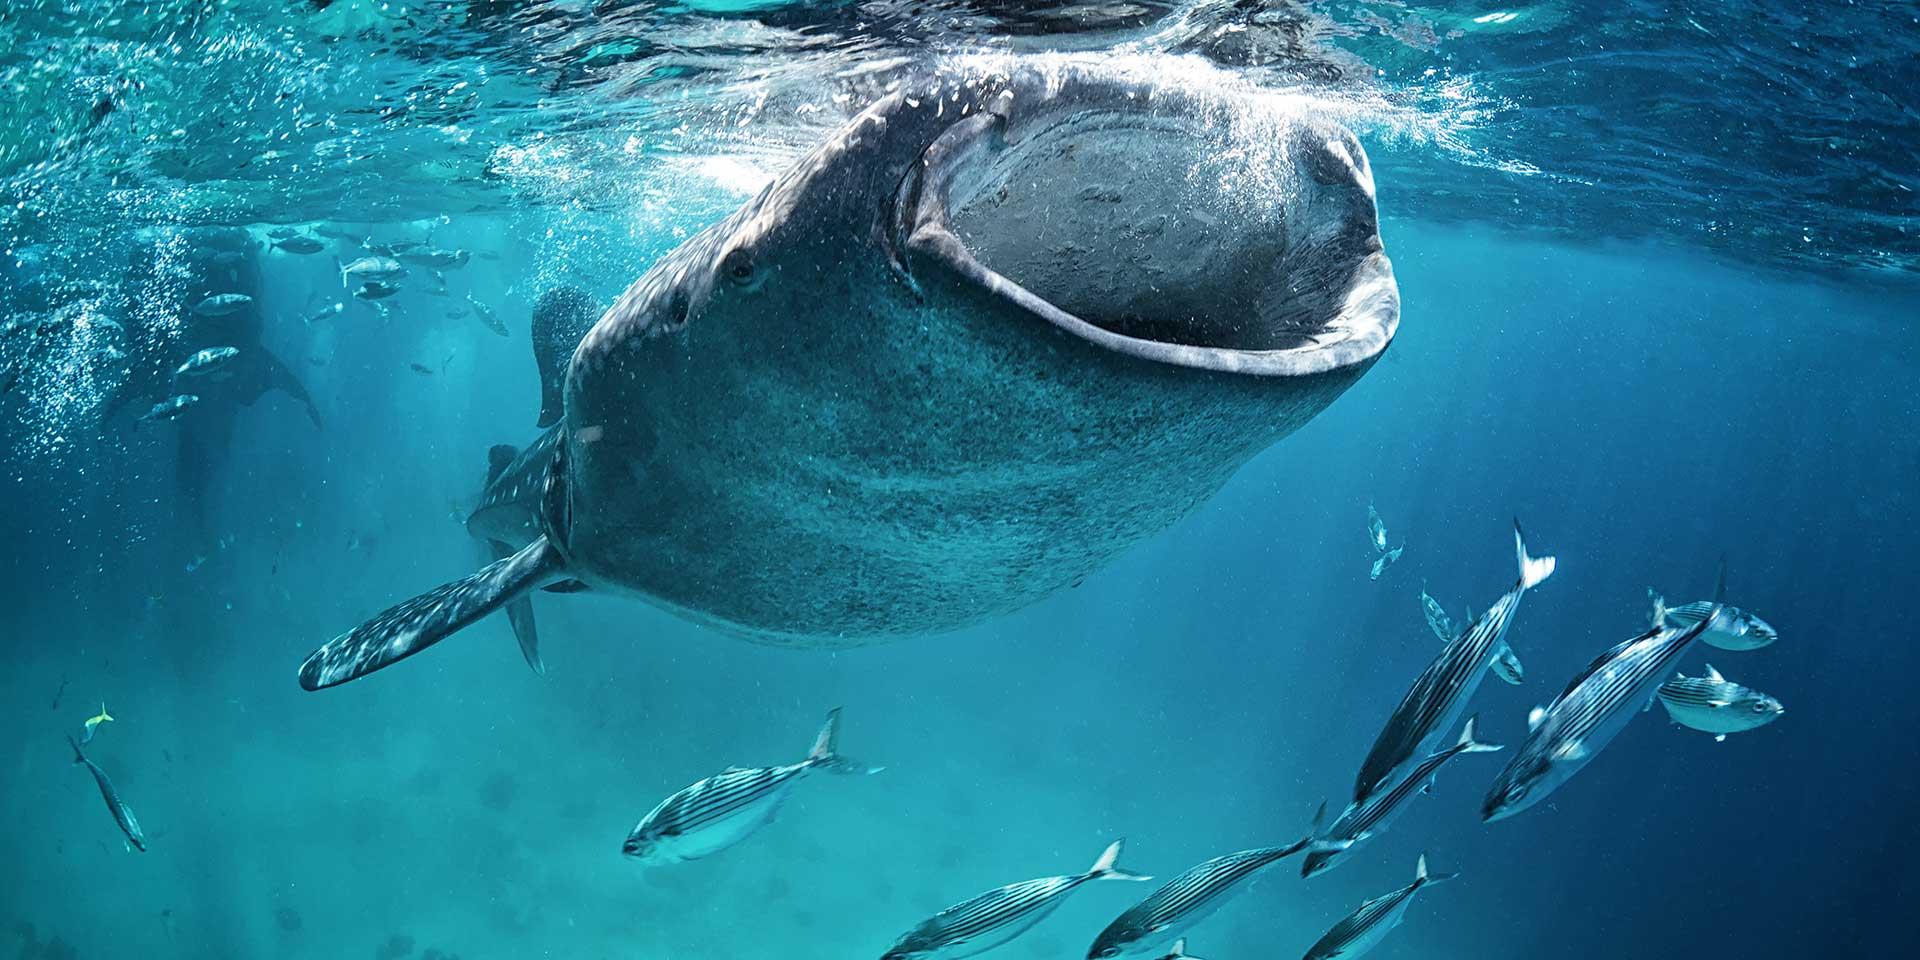 Chasing Five of Indonesia's Underwater Superstars